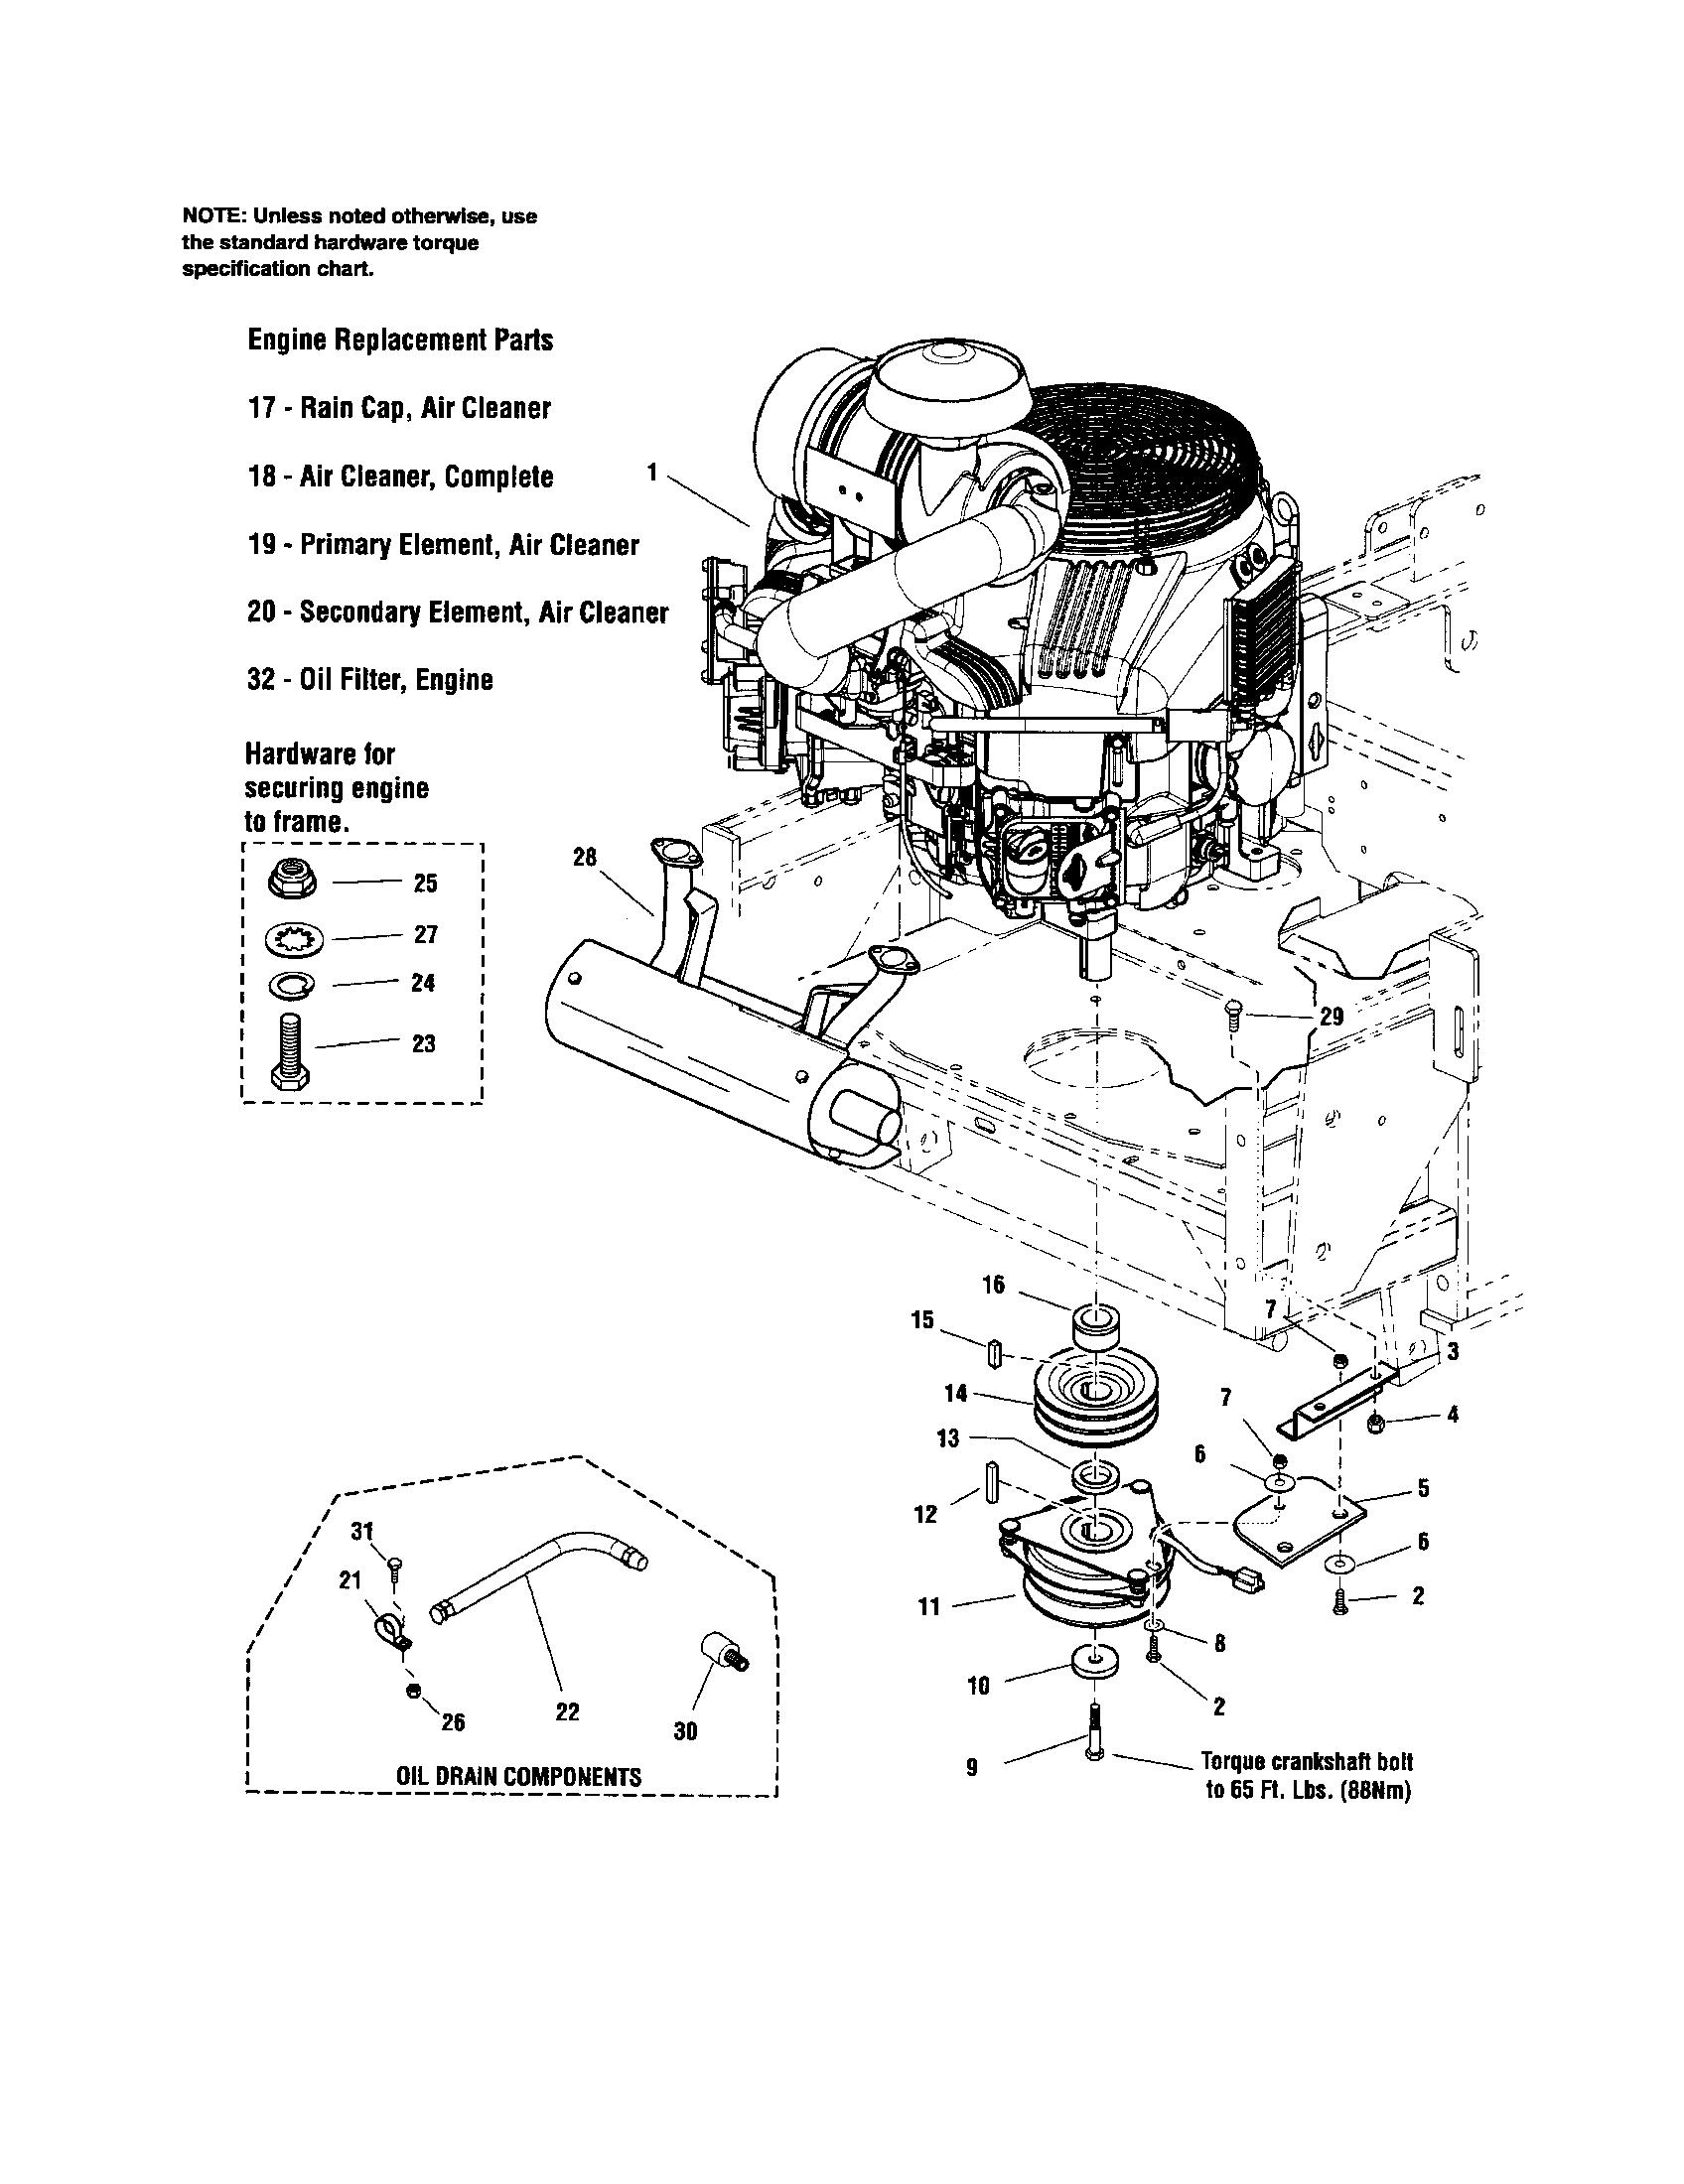 Snapper zero turn riding mower engine pto 32 hp briggs stratton parts